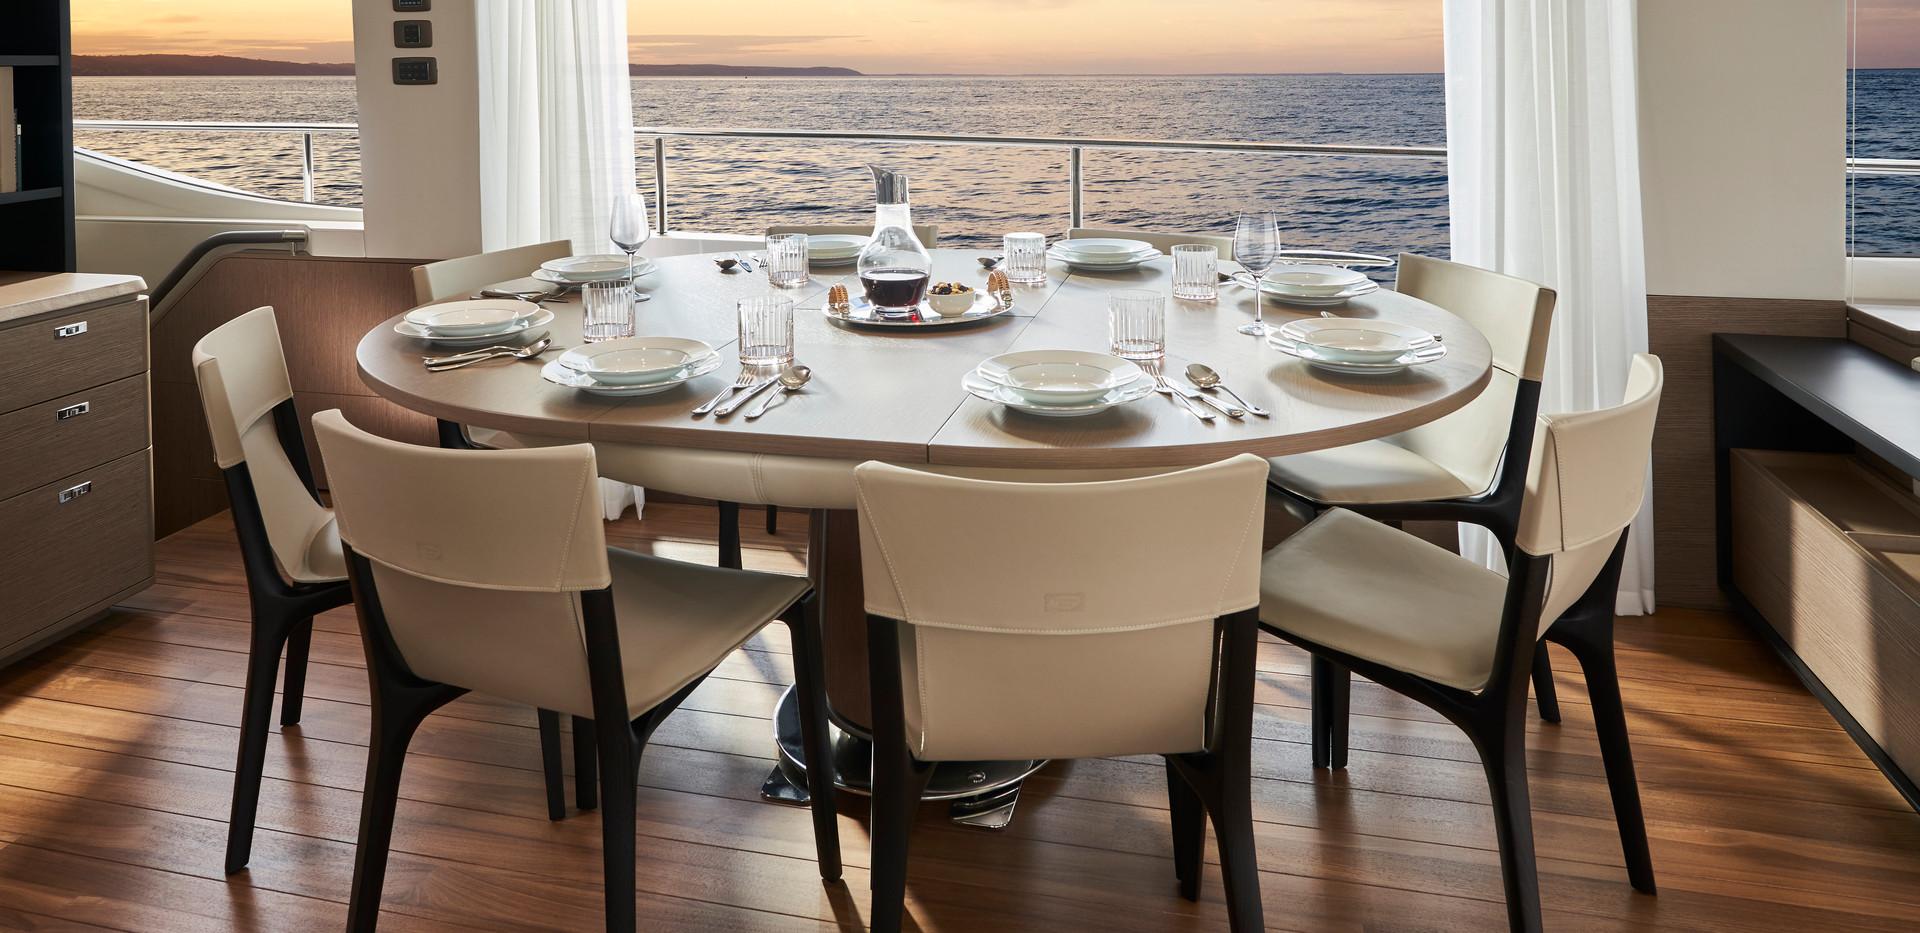 y85-interior-silver-oak-satin-dining-tab